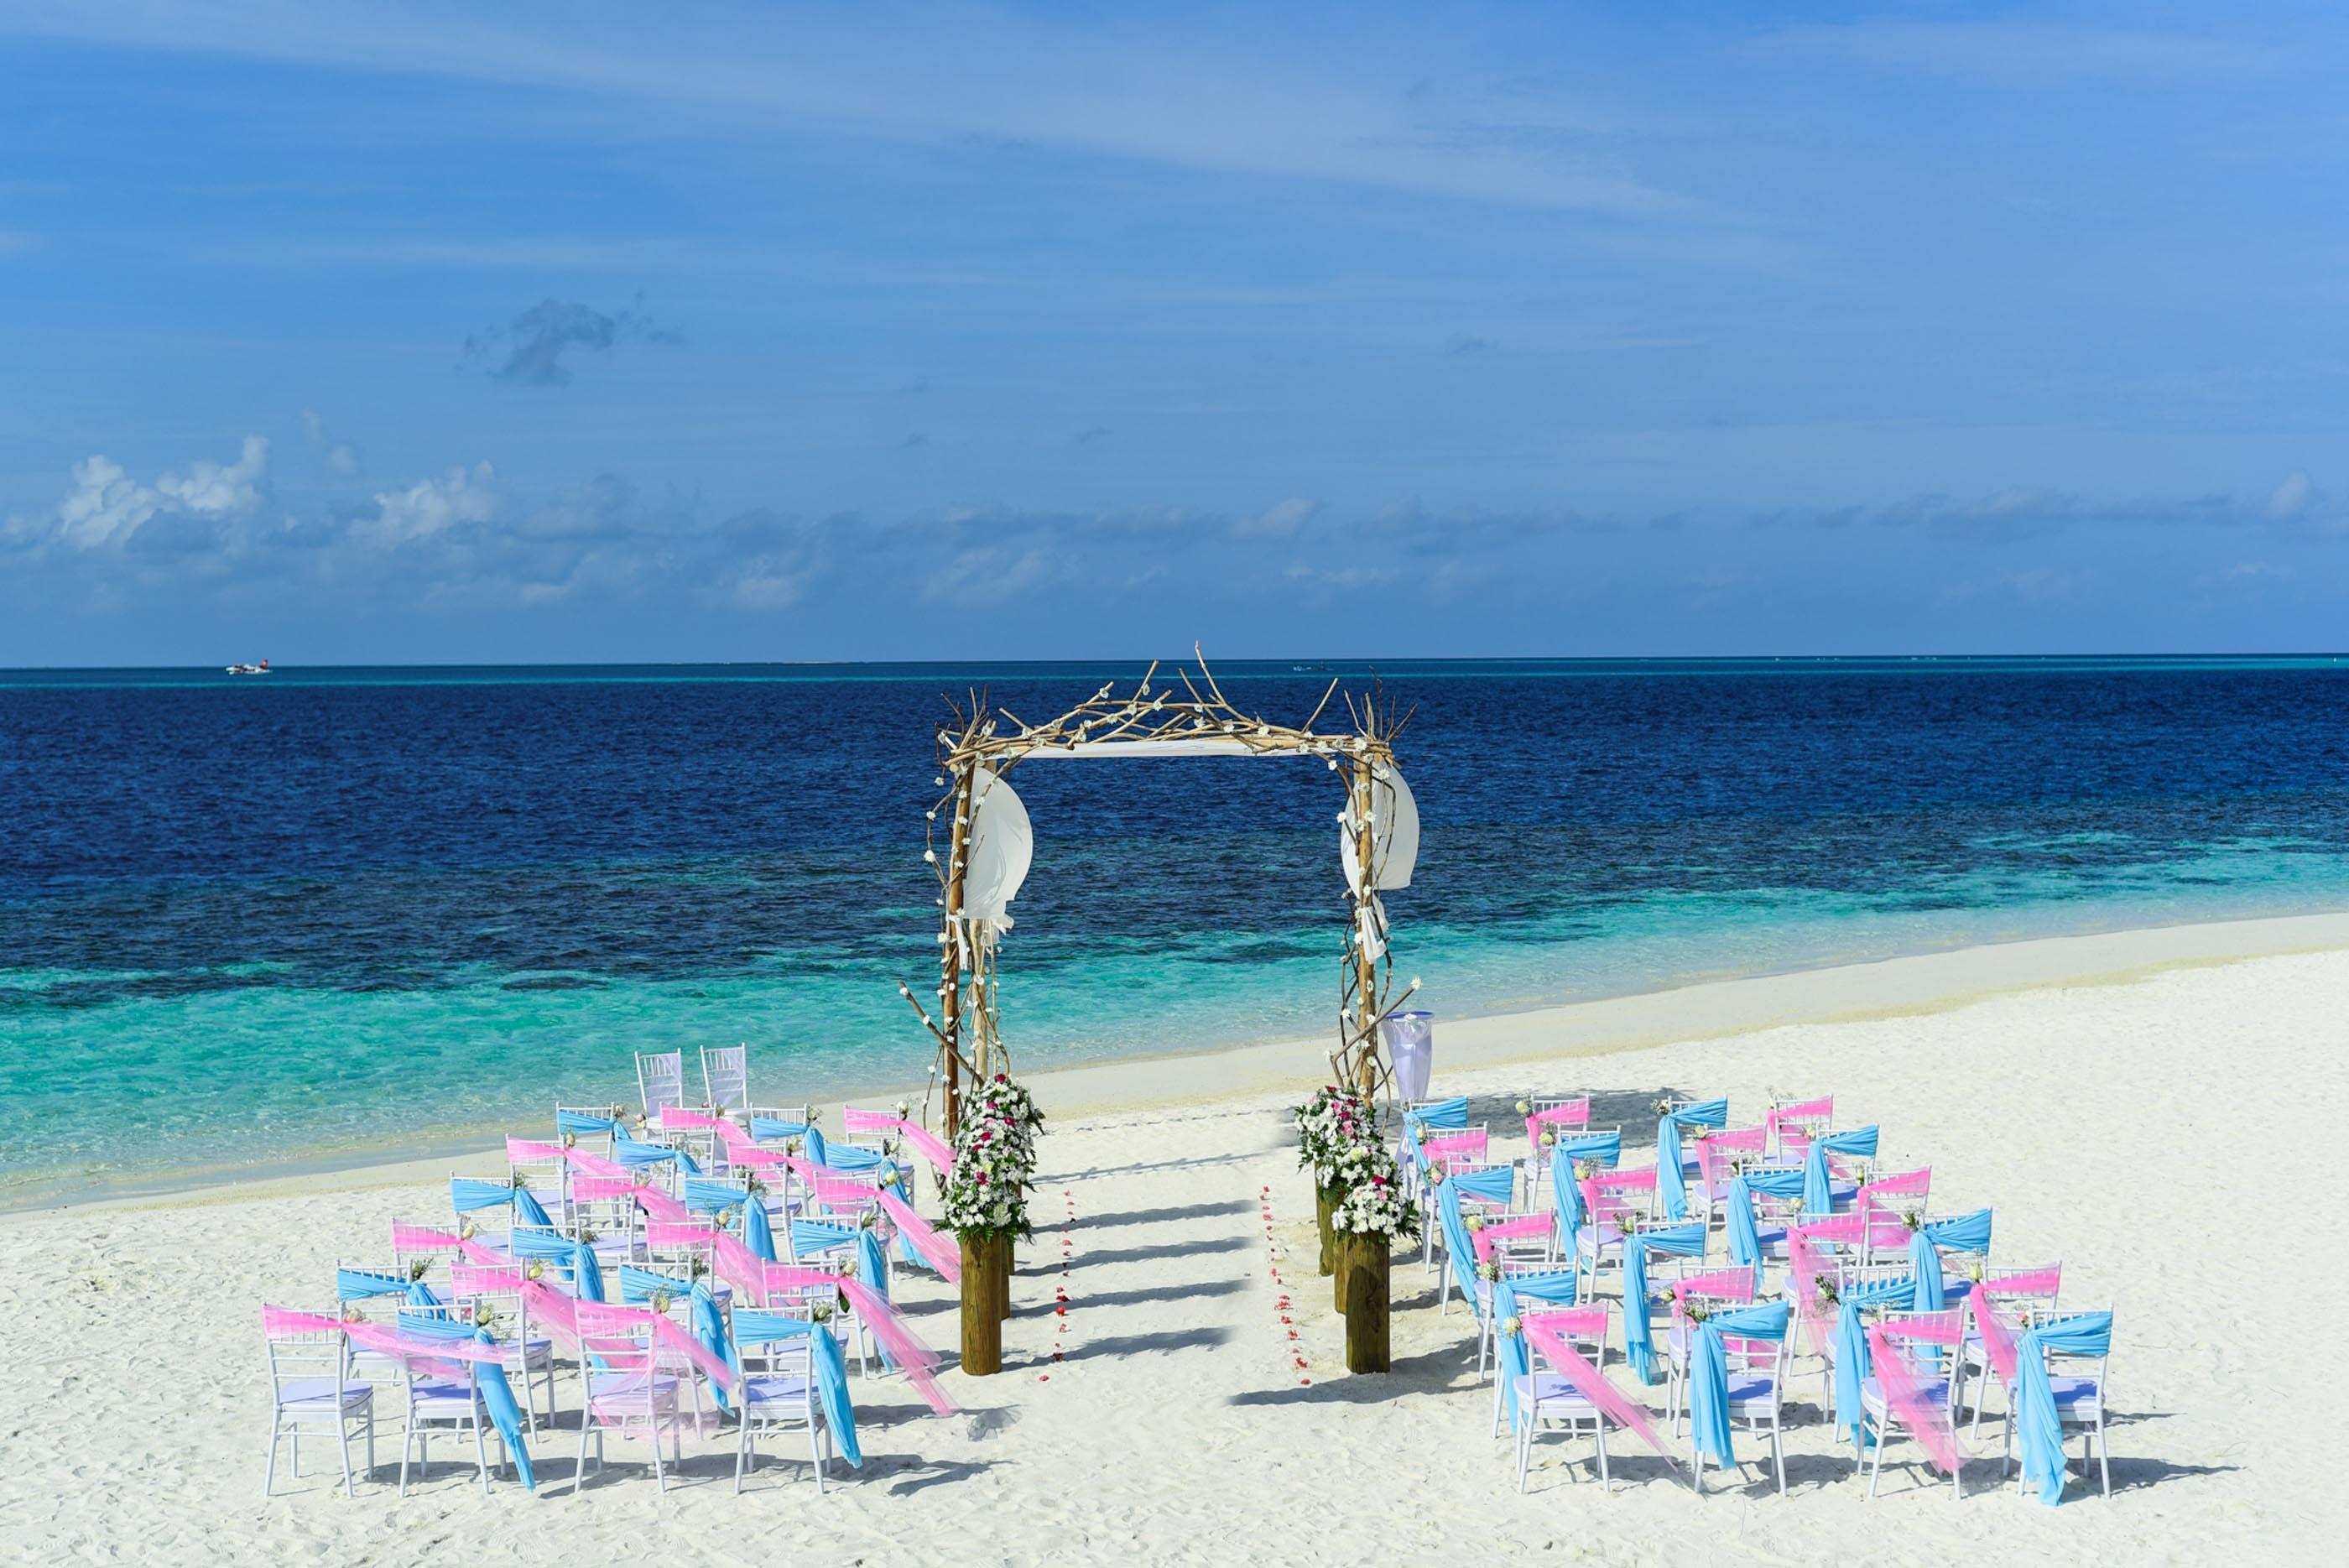 Free stock photo of Asad, atoll, decor, decorations